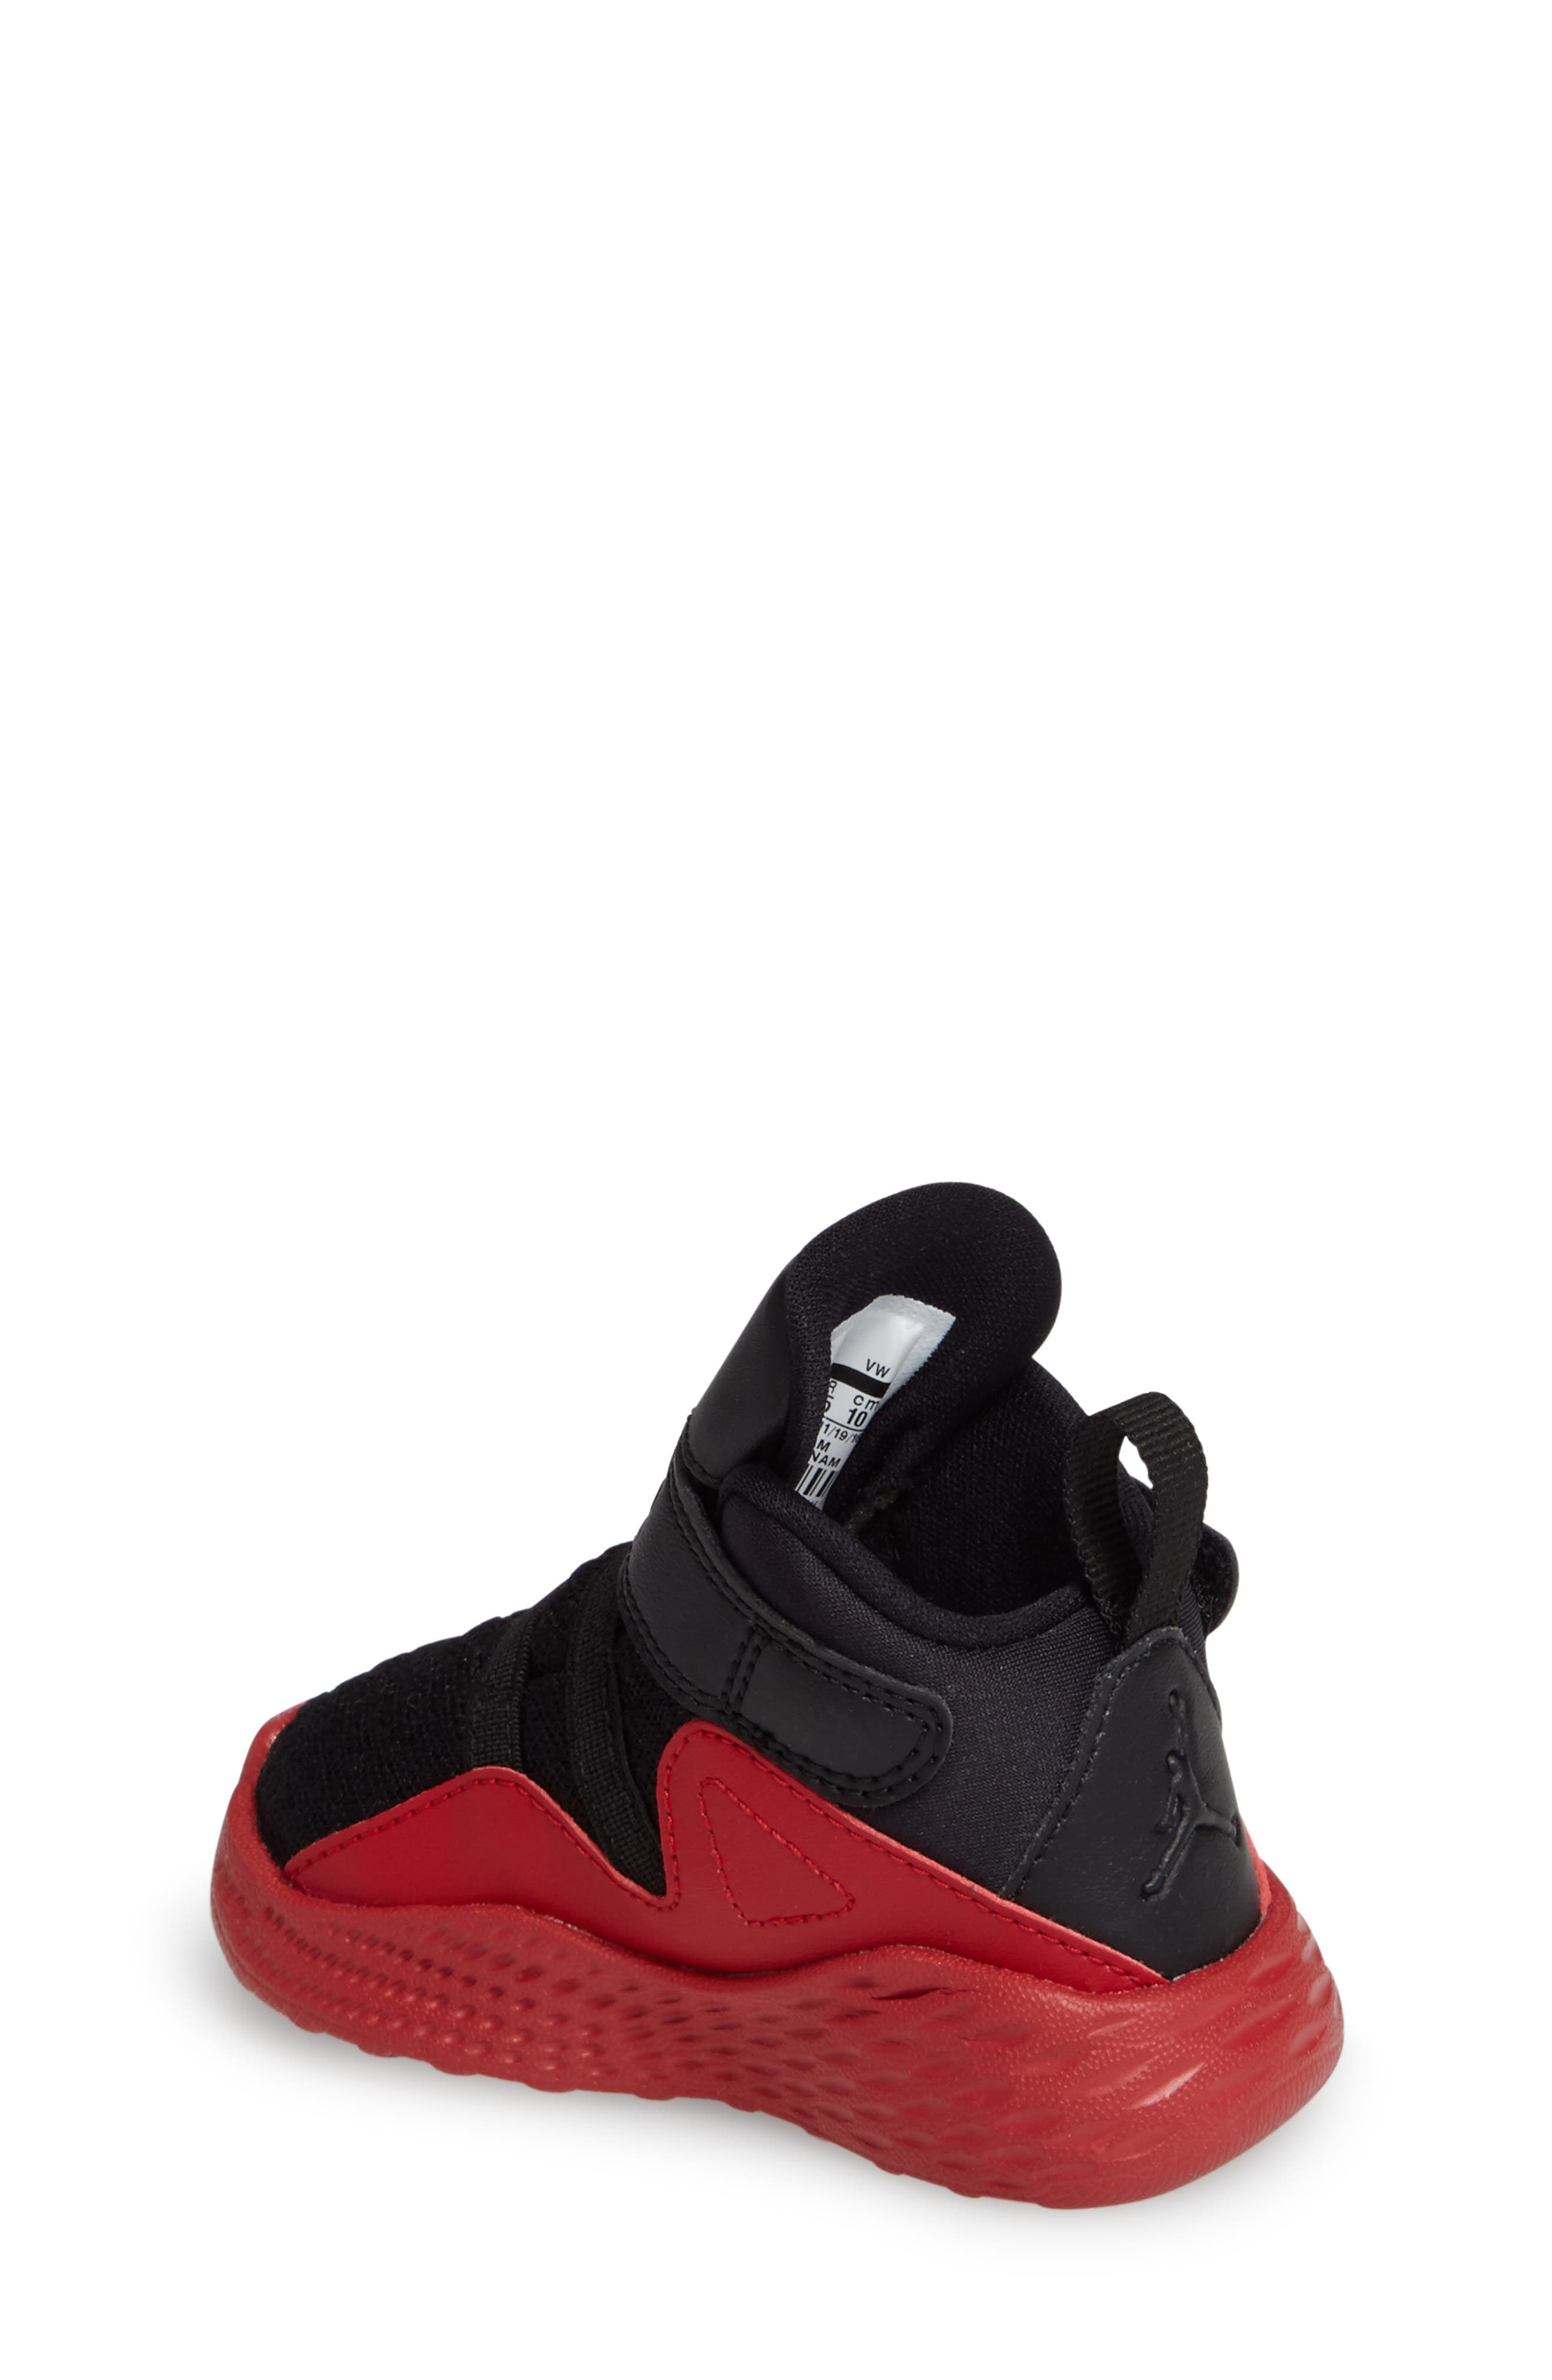 Jordan Formula 23 Basketball Shoe,                             Alternate thumbnail 4, color,